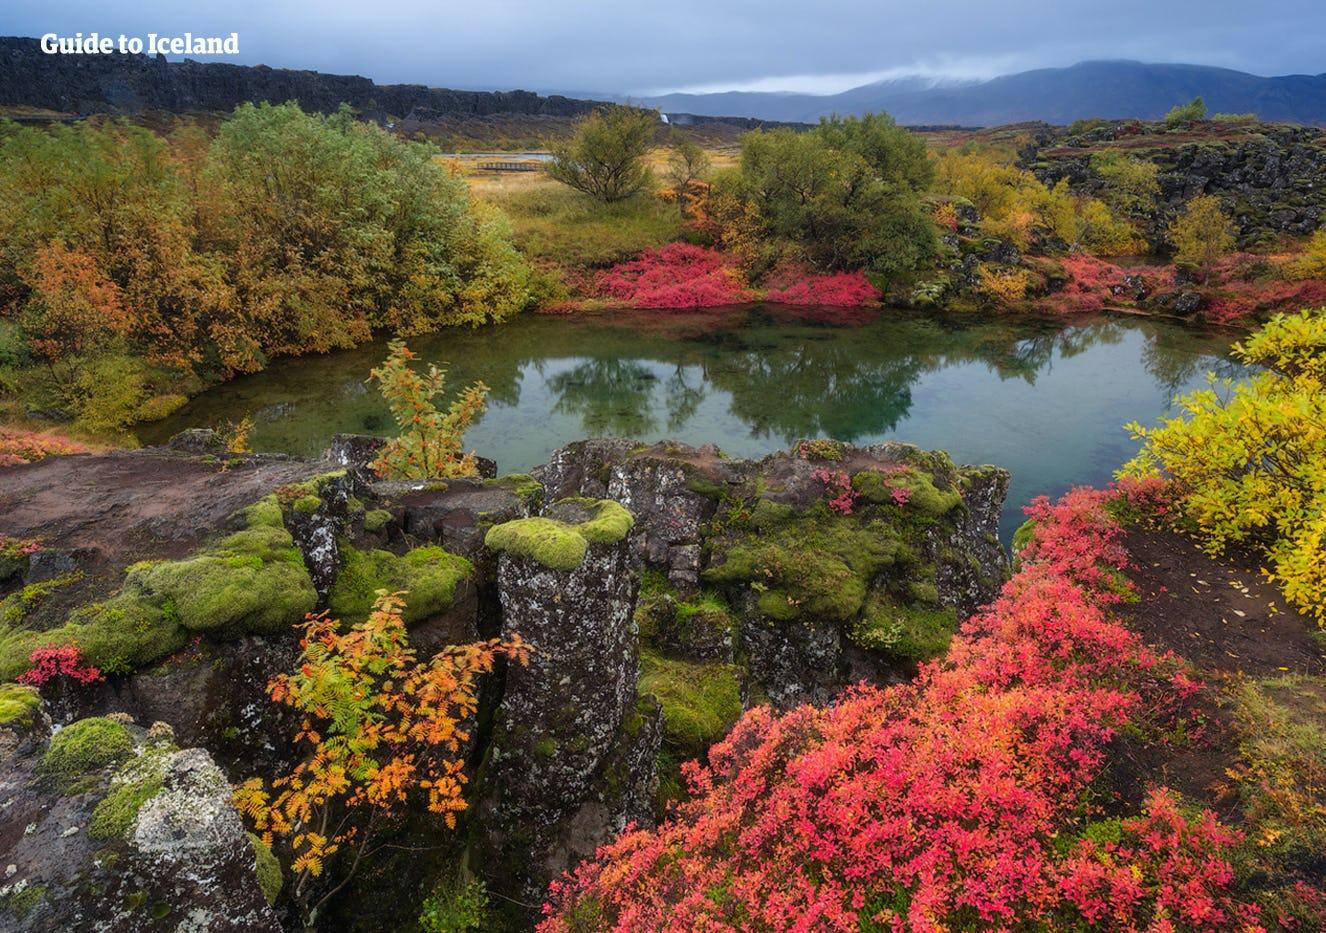 Þingvellir National Park is a vibrant and beautiful place.